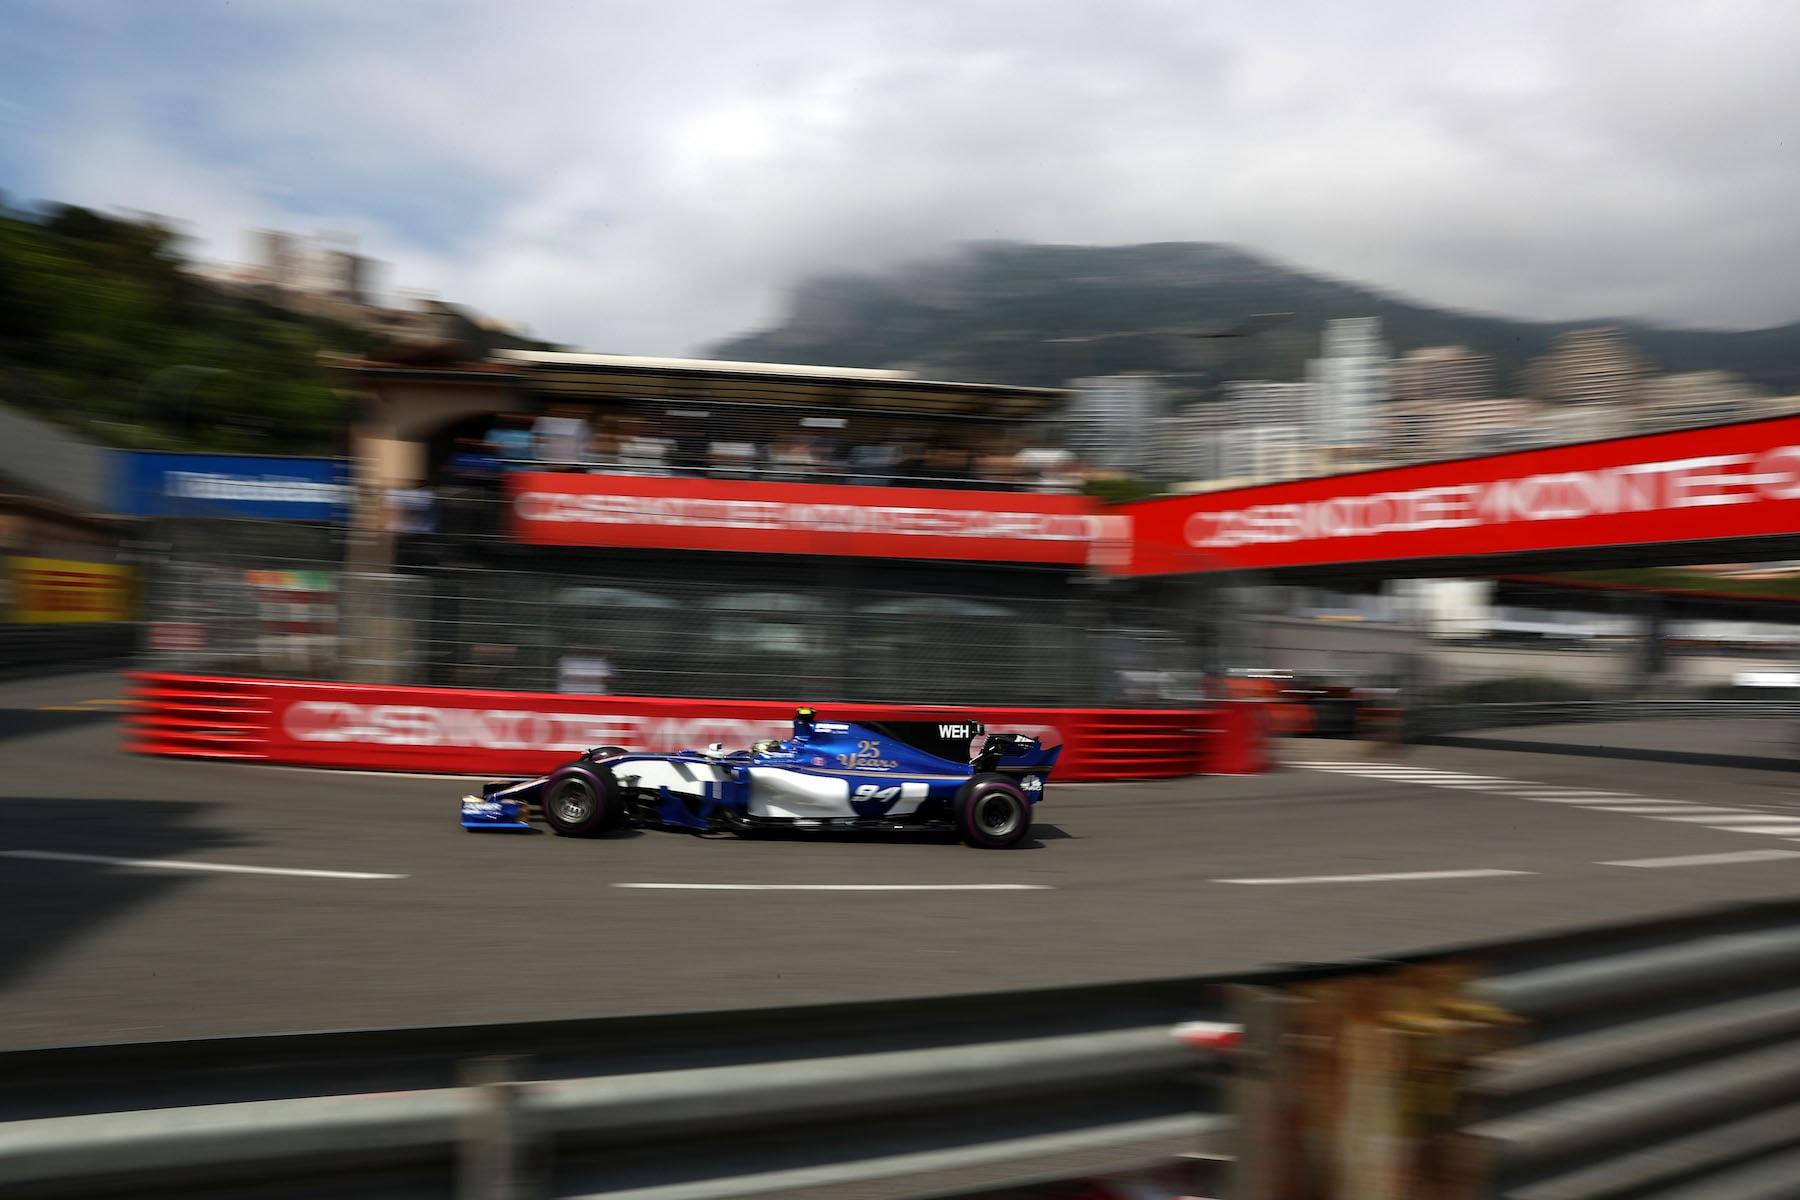 2017 Pascal Wehrlein | Sauber C36 | 2017 Monaco GP FP2 3 copy.jpg